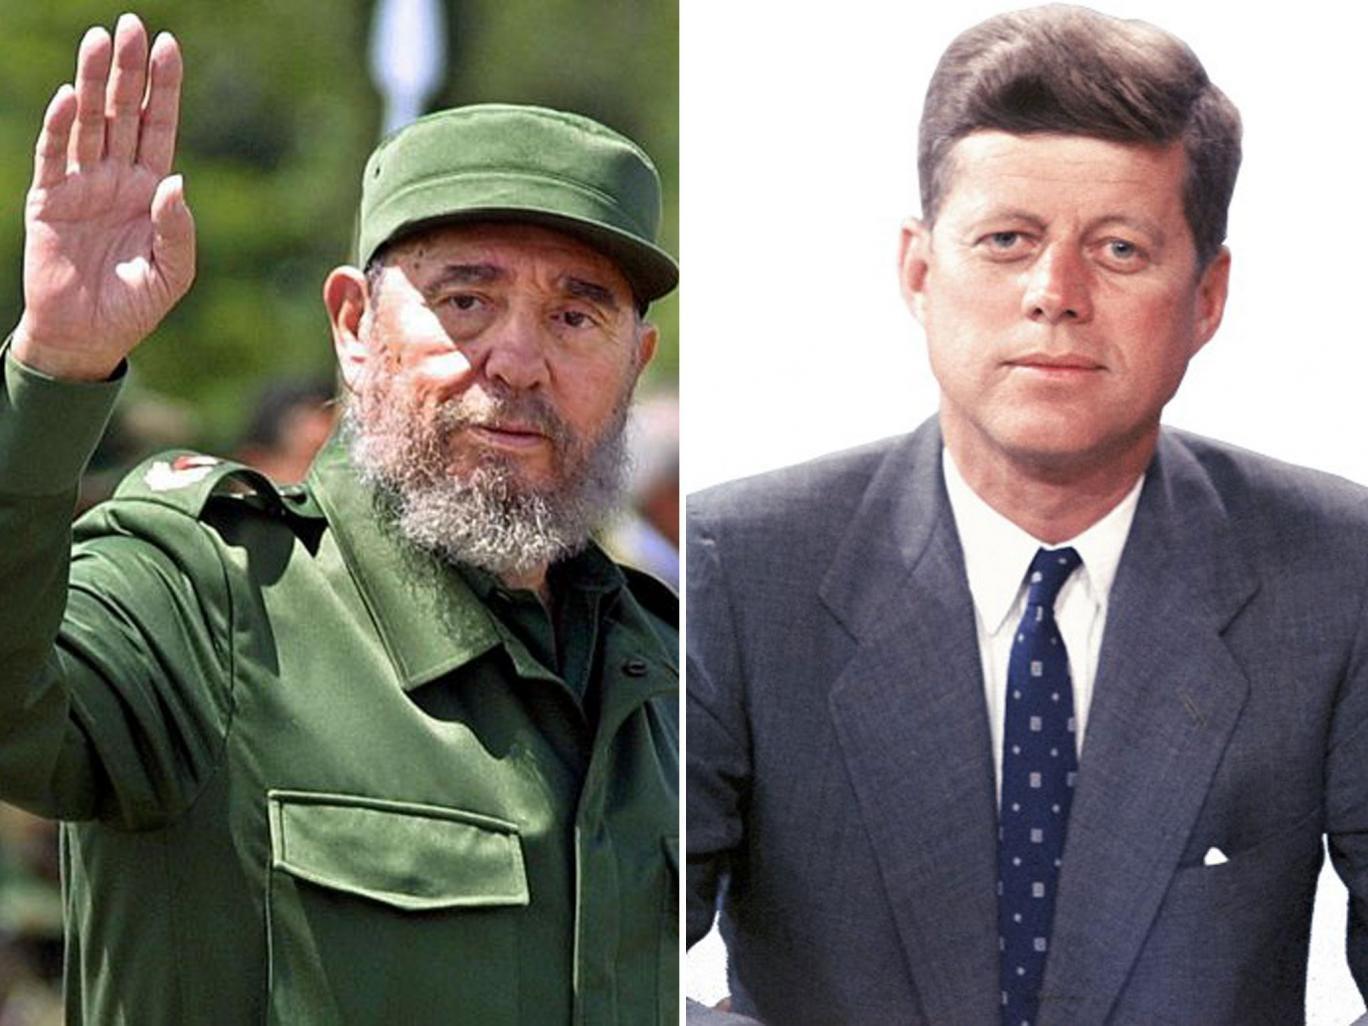 Fidel Castro and John Kennedy